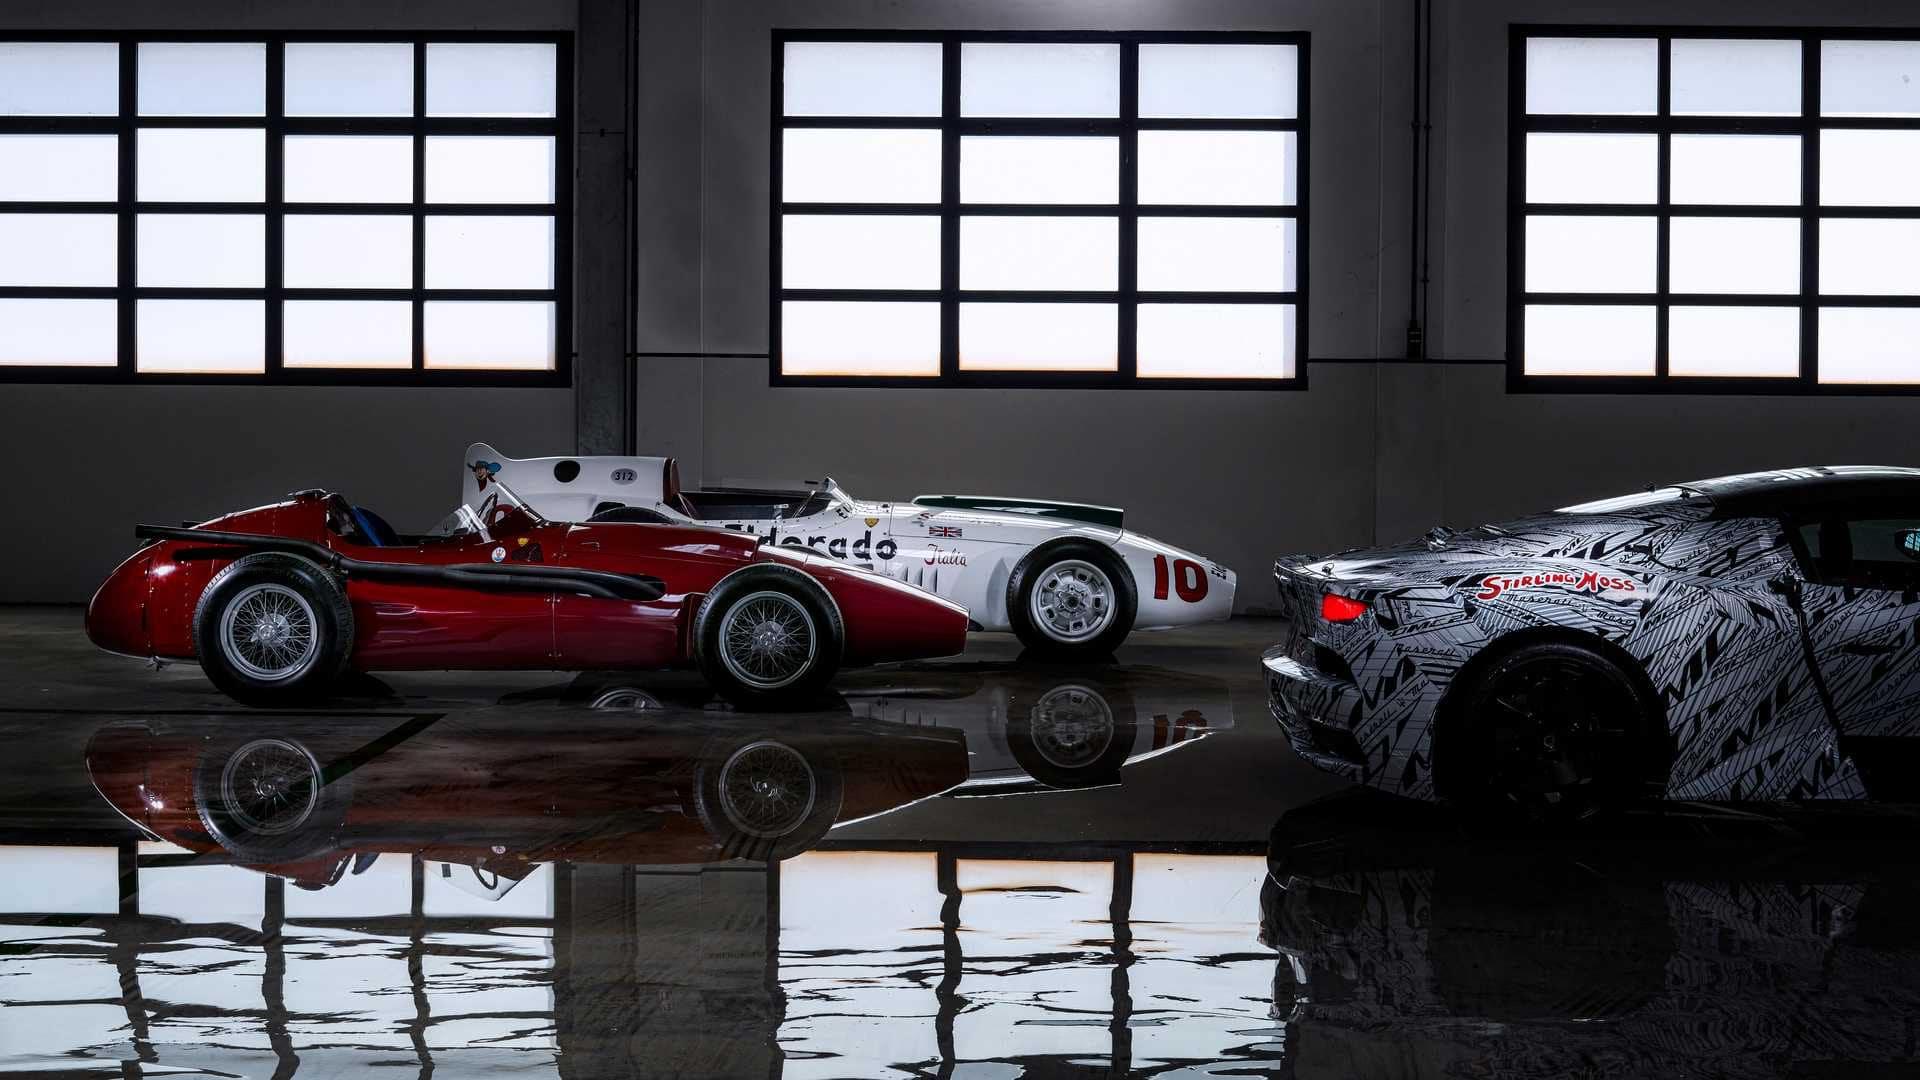 Latest Maserati MC20 Prototype Dedicated To Sir Stirling Moss